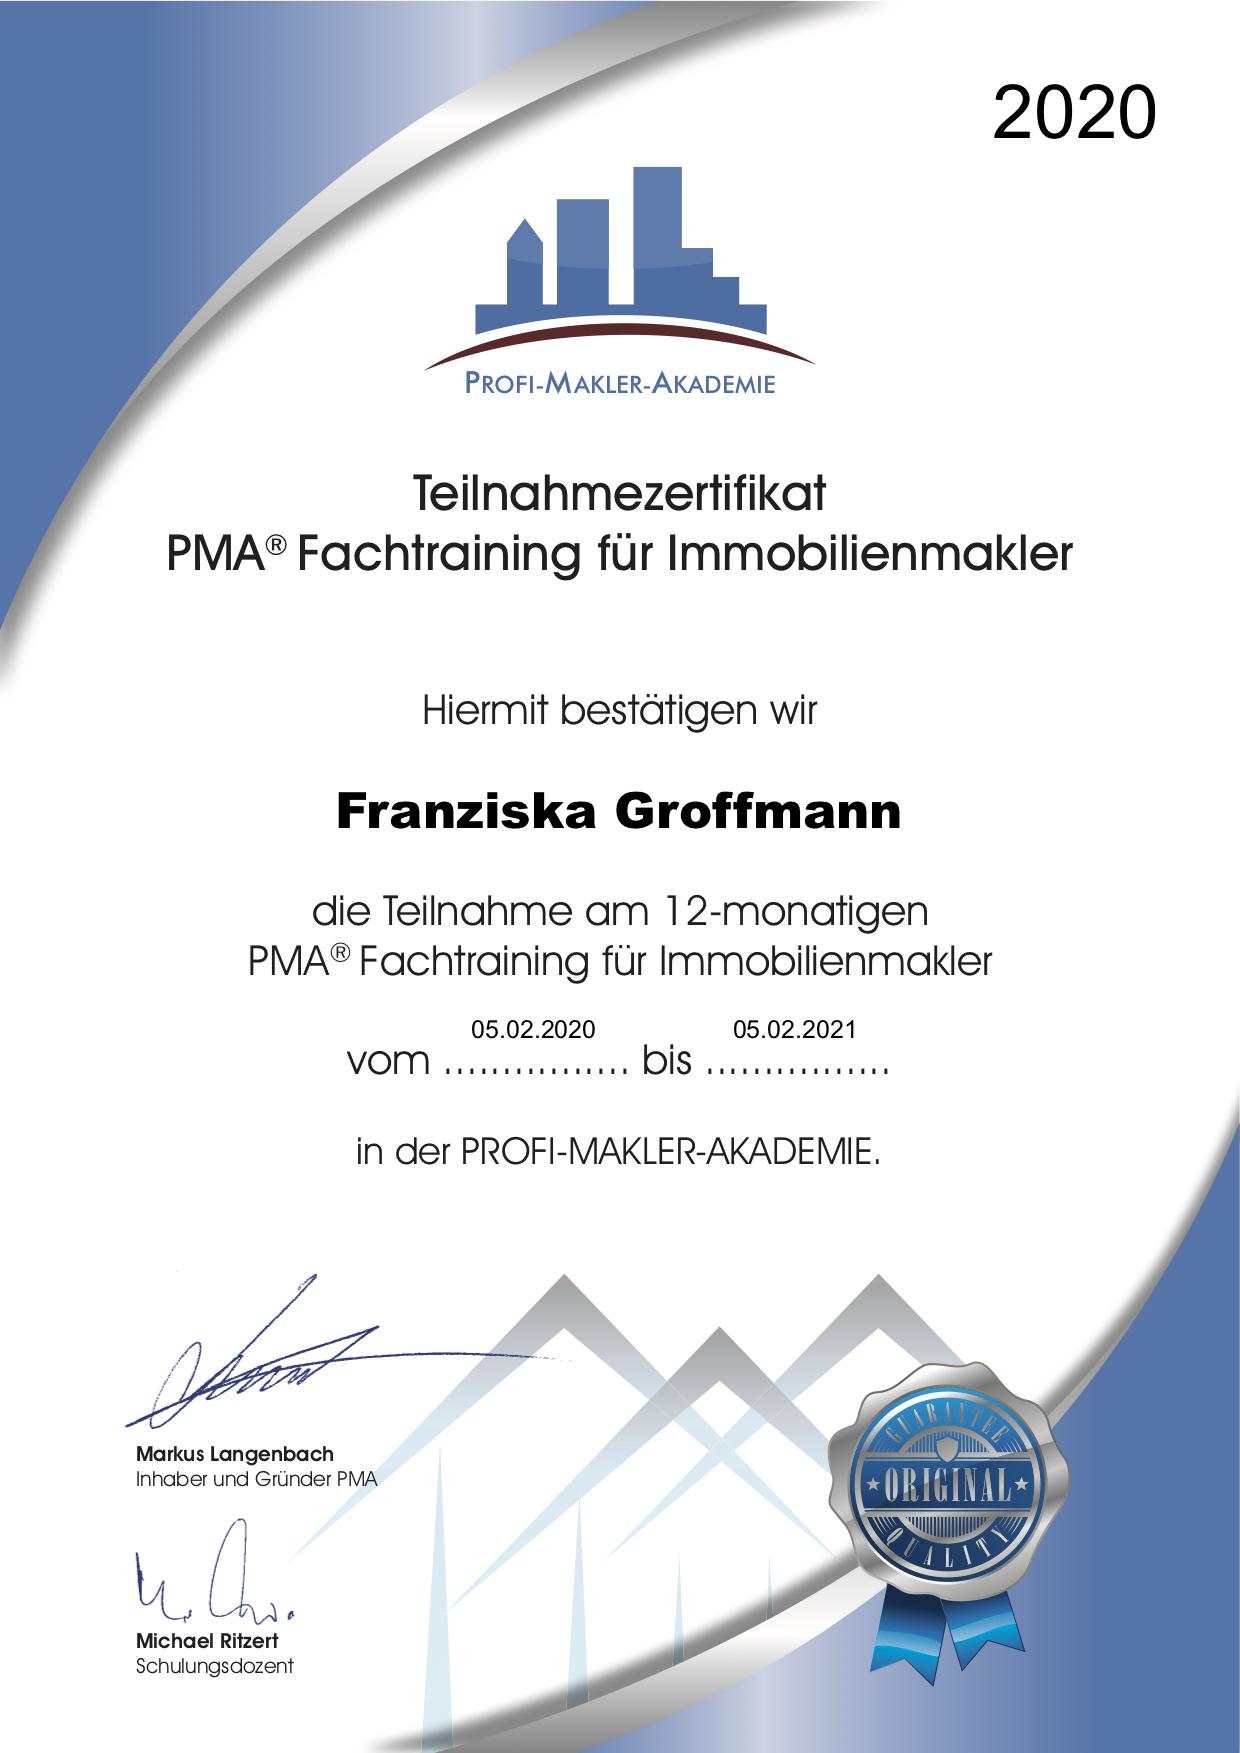 01_Zertifikat_-_PMA®_Fachtraining_für_I